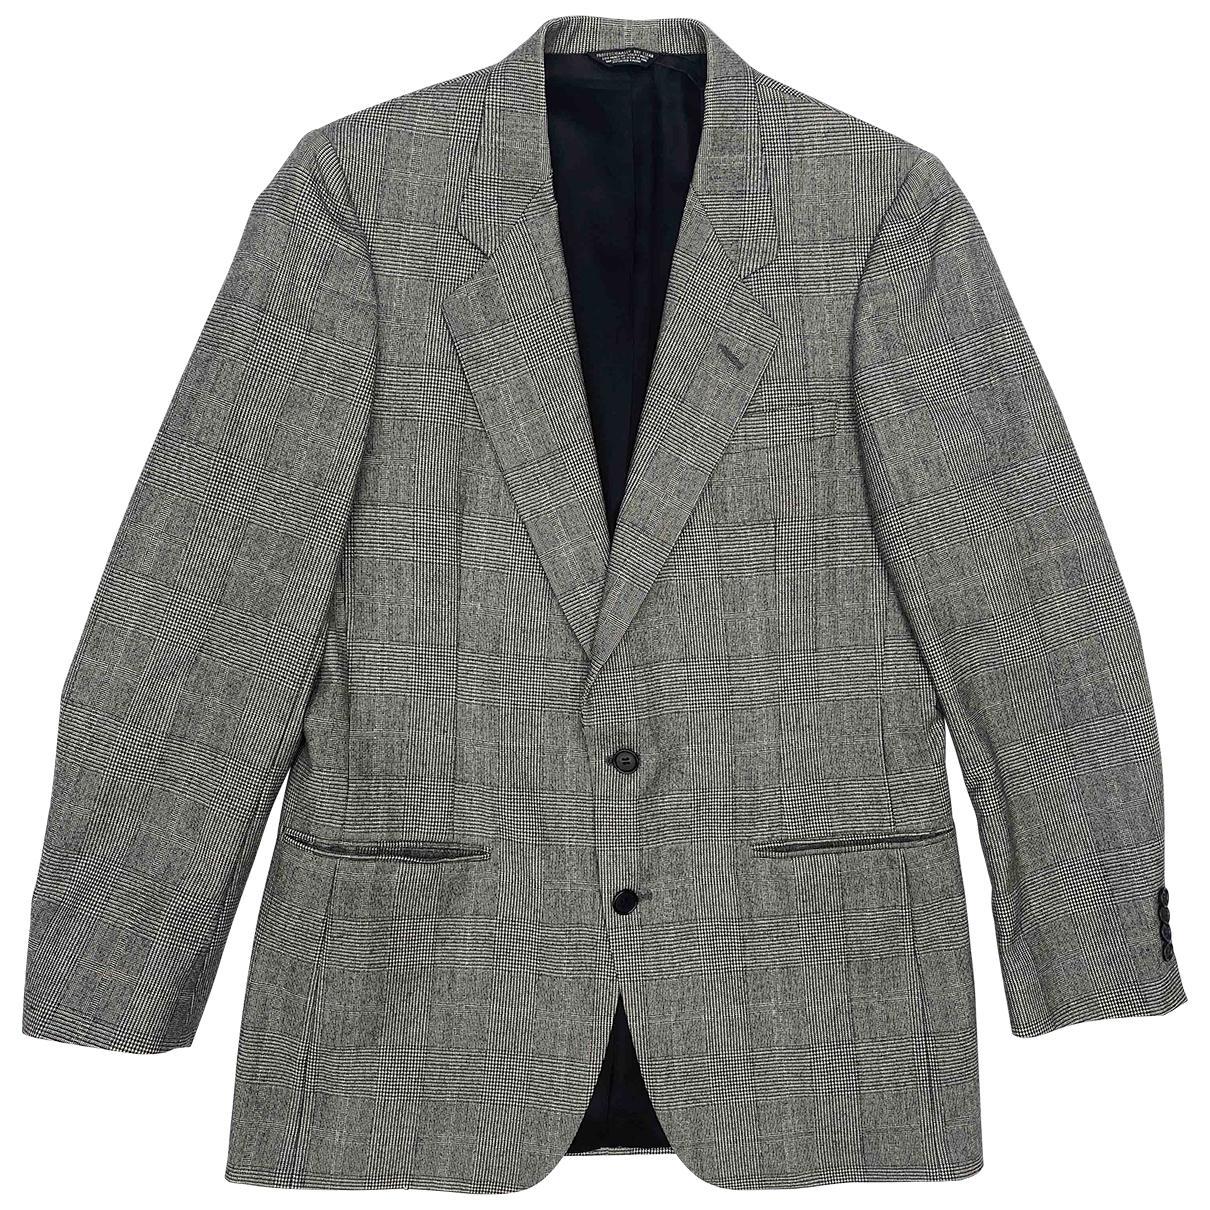 Pierre Cardin \N Black Wool Suits for Men S International